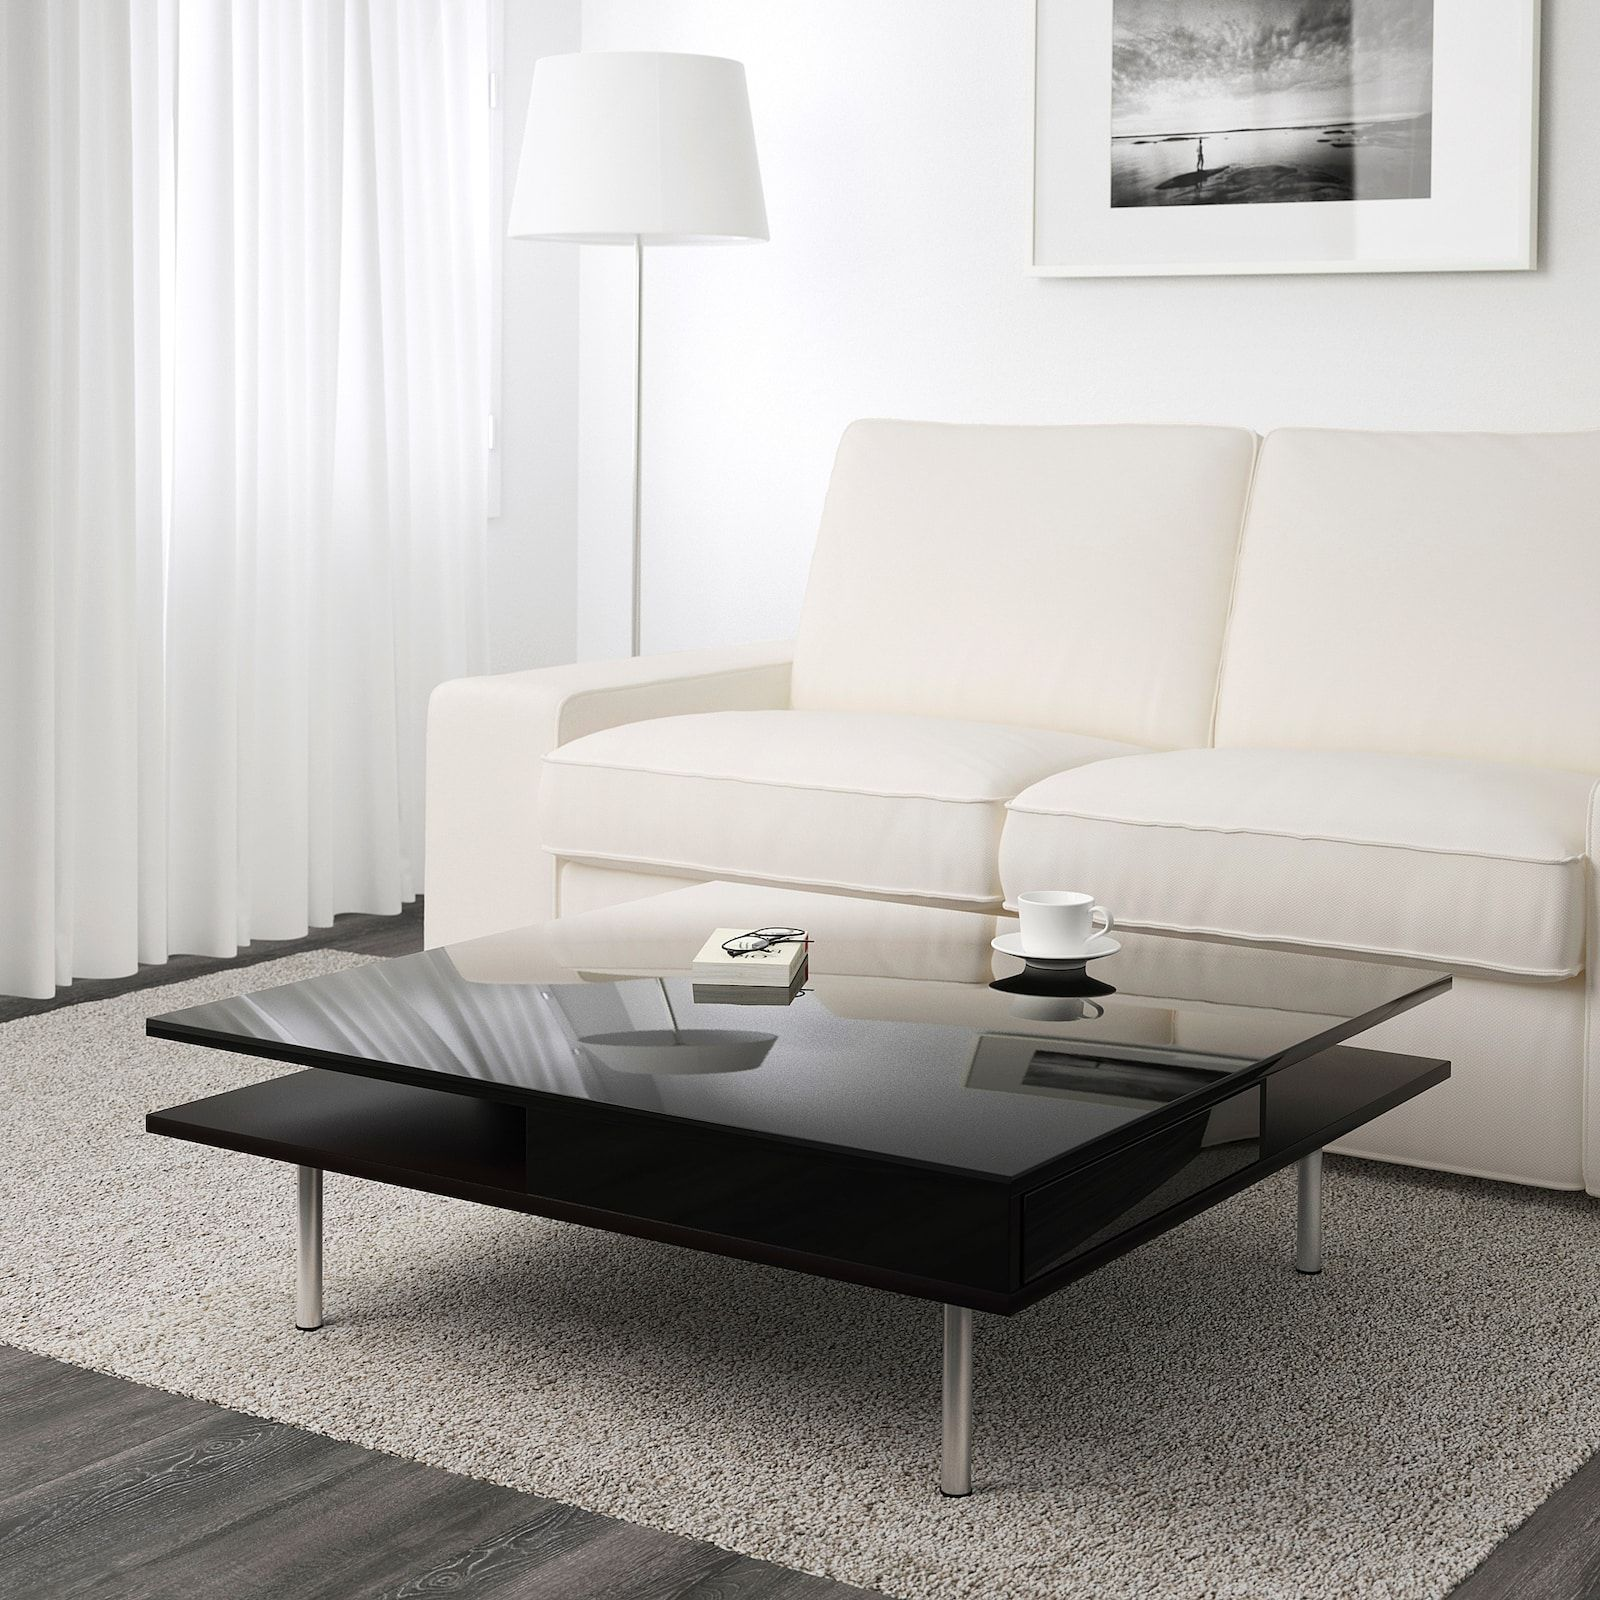 Tofteryd Coffee Table High Gloss Black 37 3 8x37 3 8 Ikea In 2021 White Living Room Tables Ikea Living Room Tables Ikea Coffee Table [ 1600 x 1600 Pixel ]